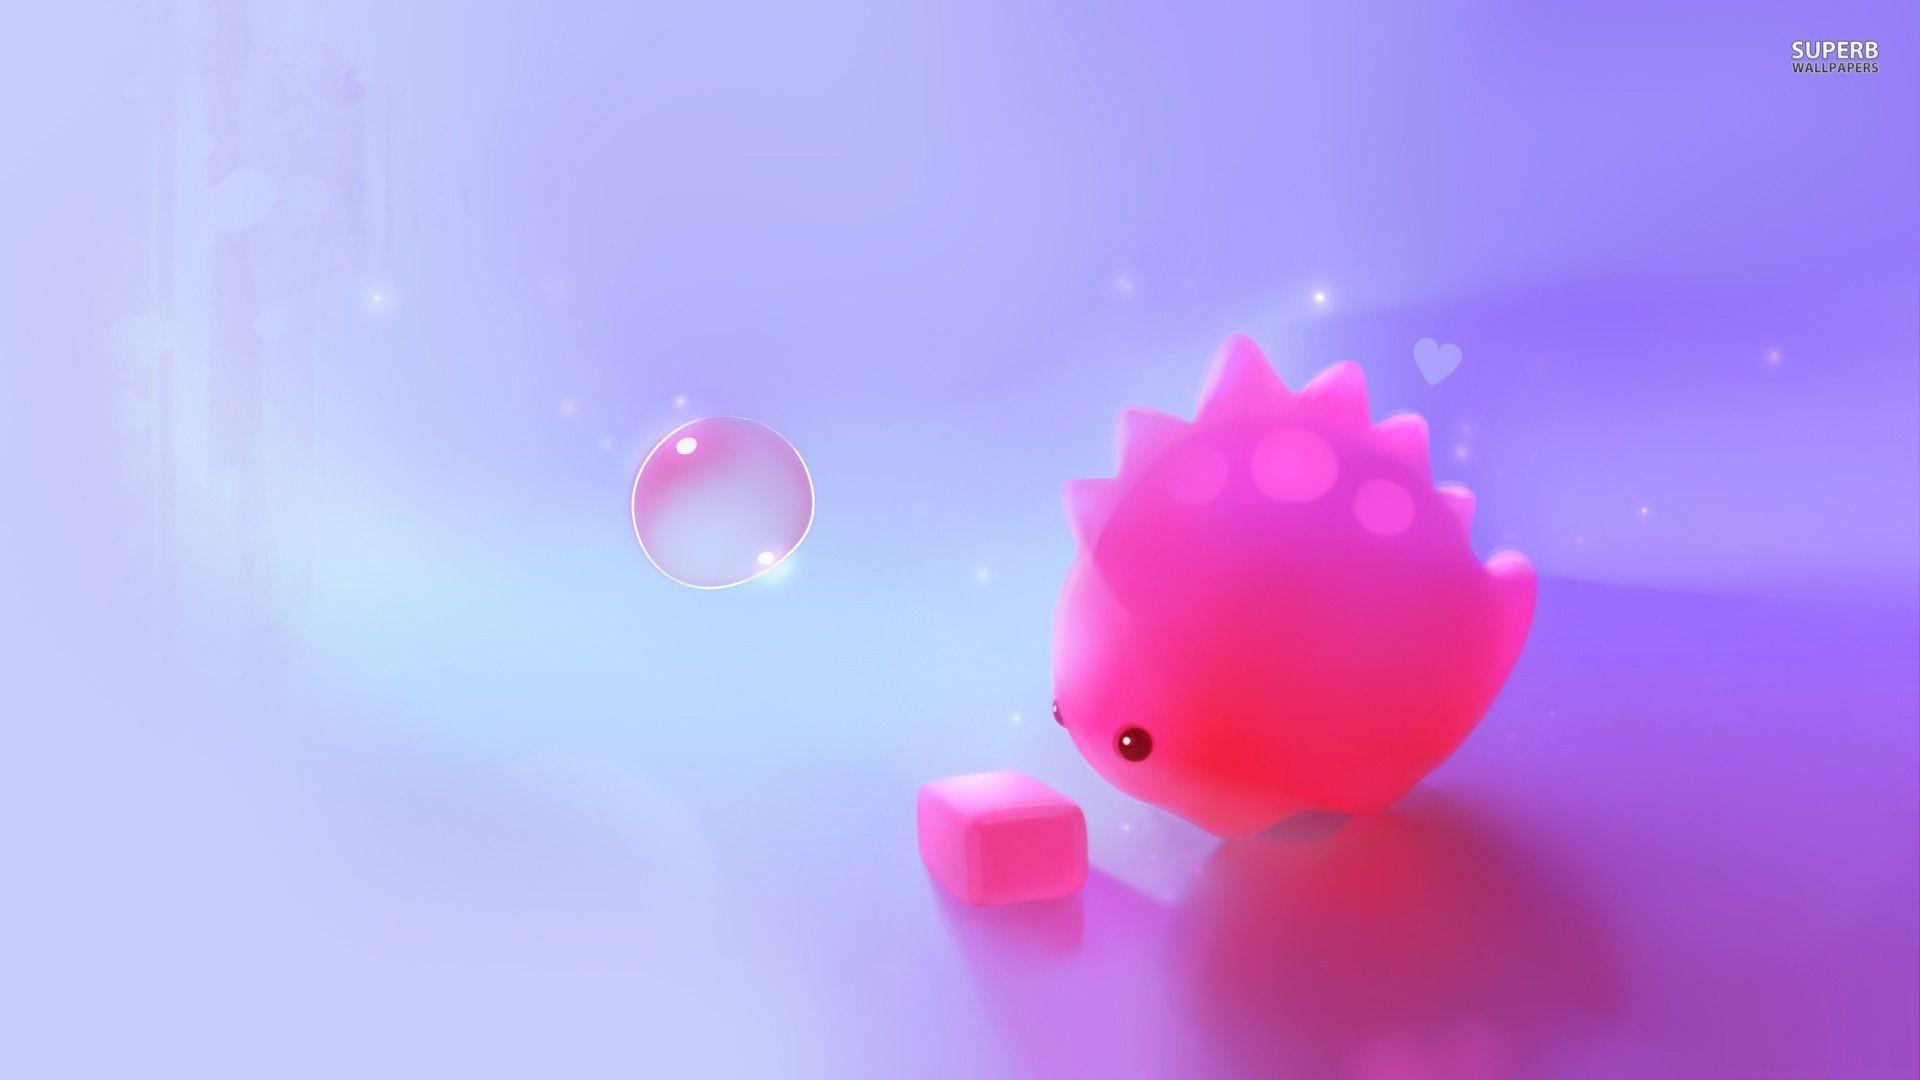 Cute Pink Desktop Wallpaper